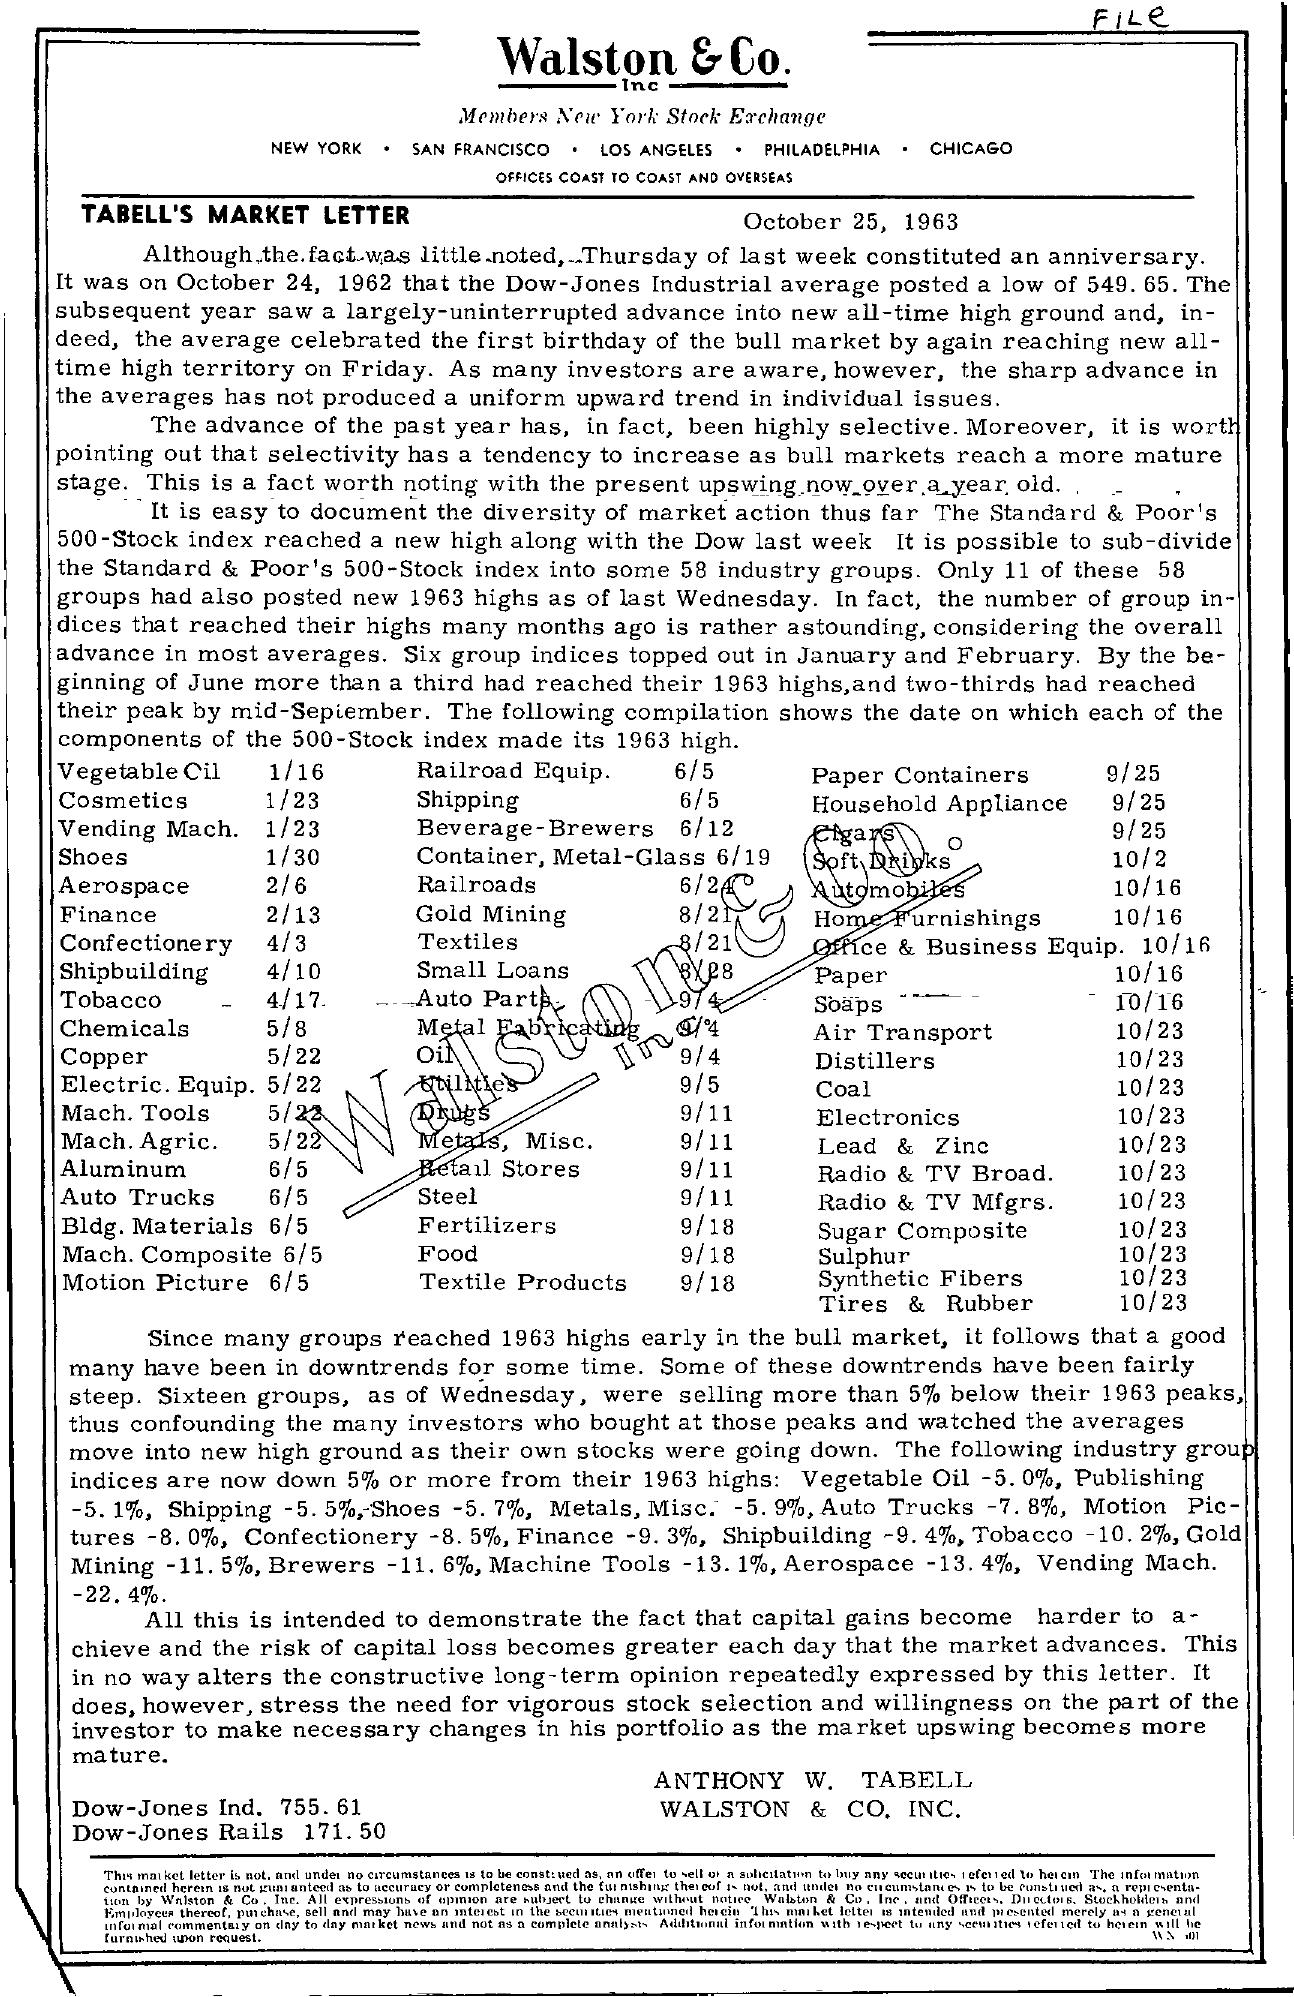 Tabell's Market Letter - October 25, 1963